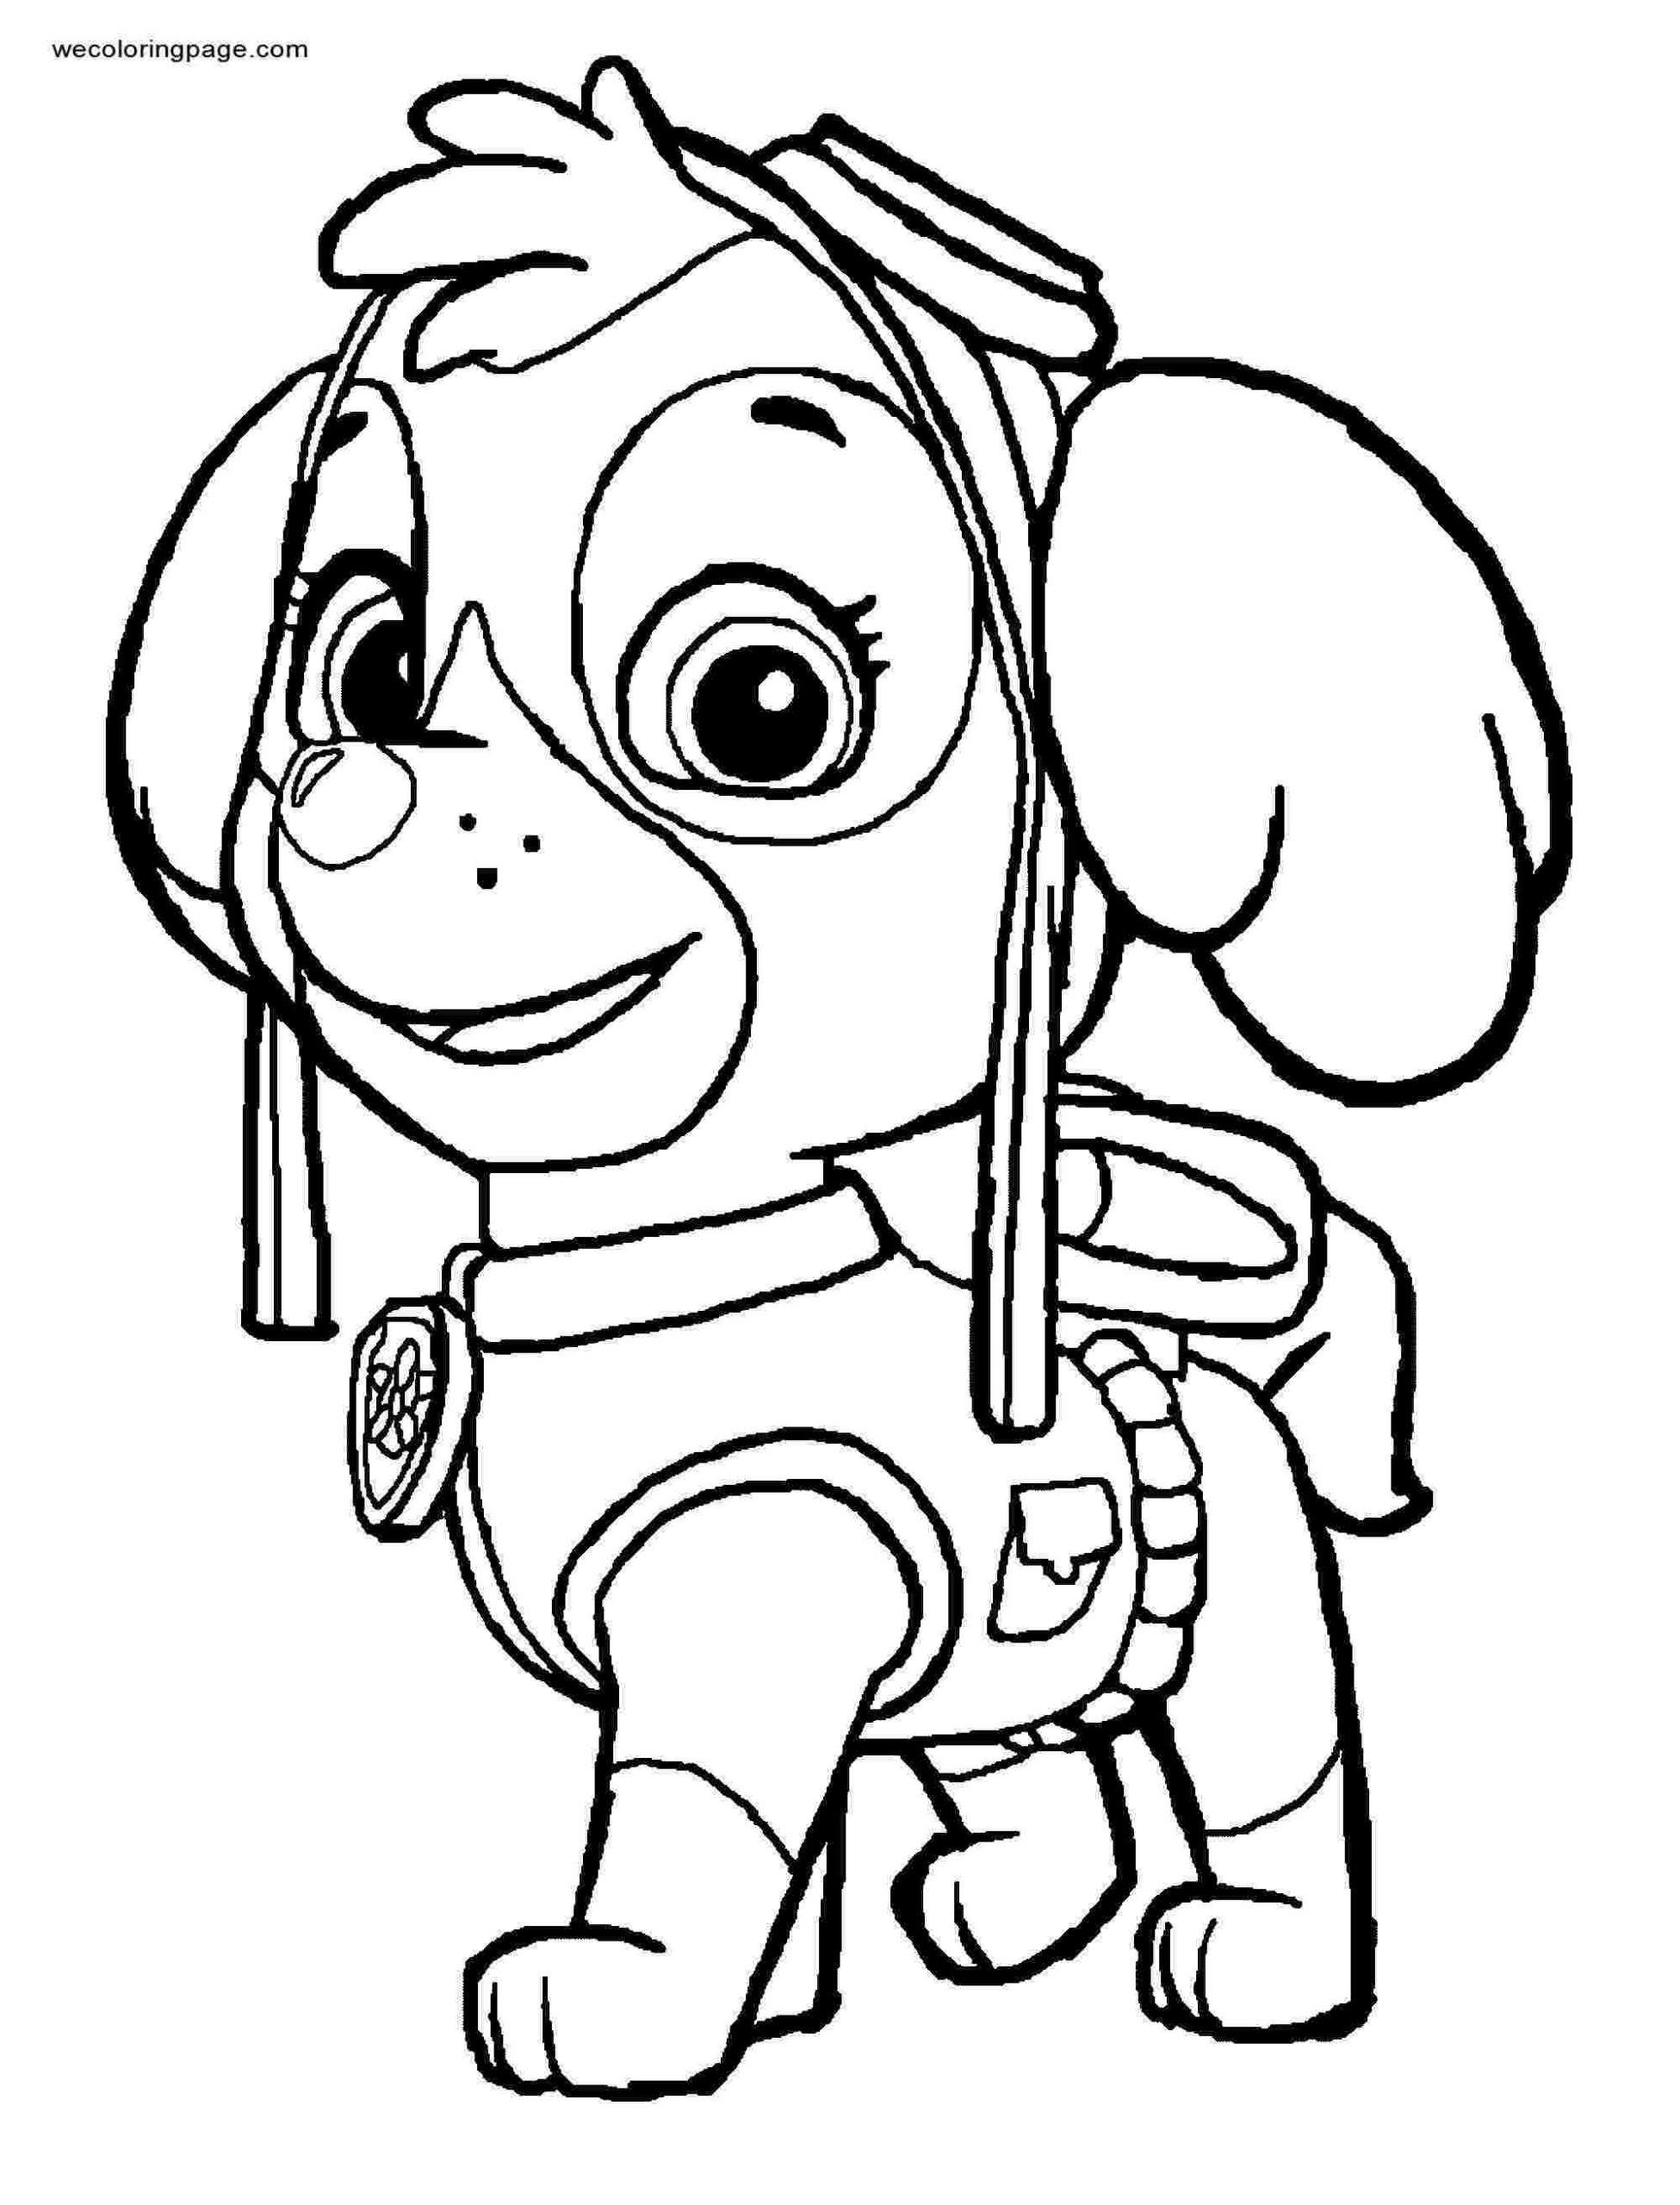 9 paw patrol skye coloring page - coloringpagesinspiration